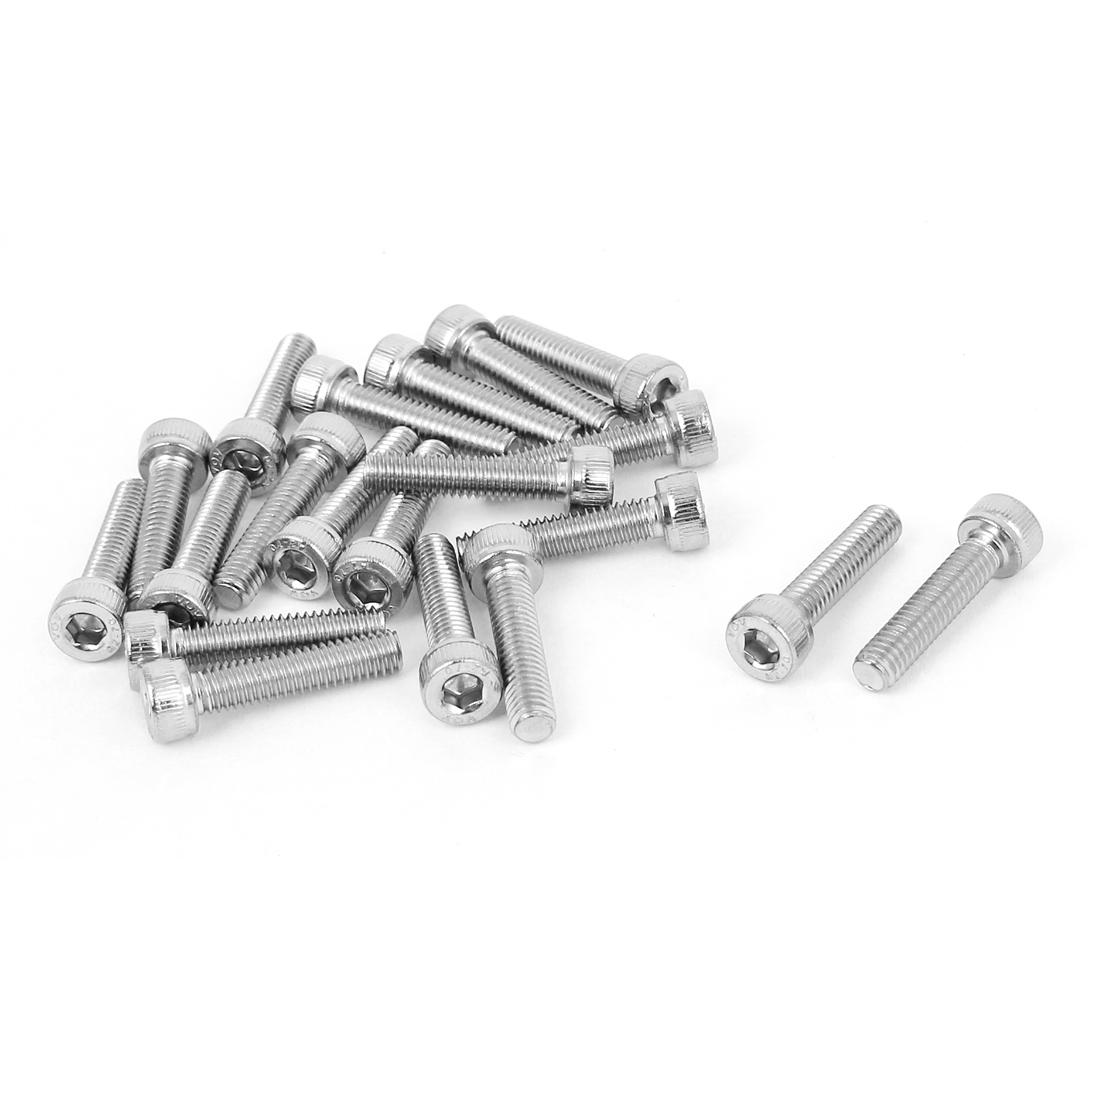 M4x18mm Stainless Steel Socket Cap Screws Hex Drive Keys 7mm Head Diameter 20pcs